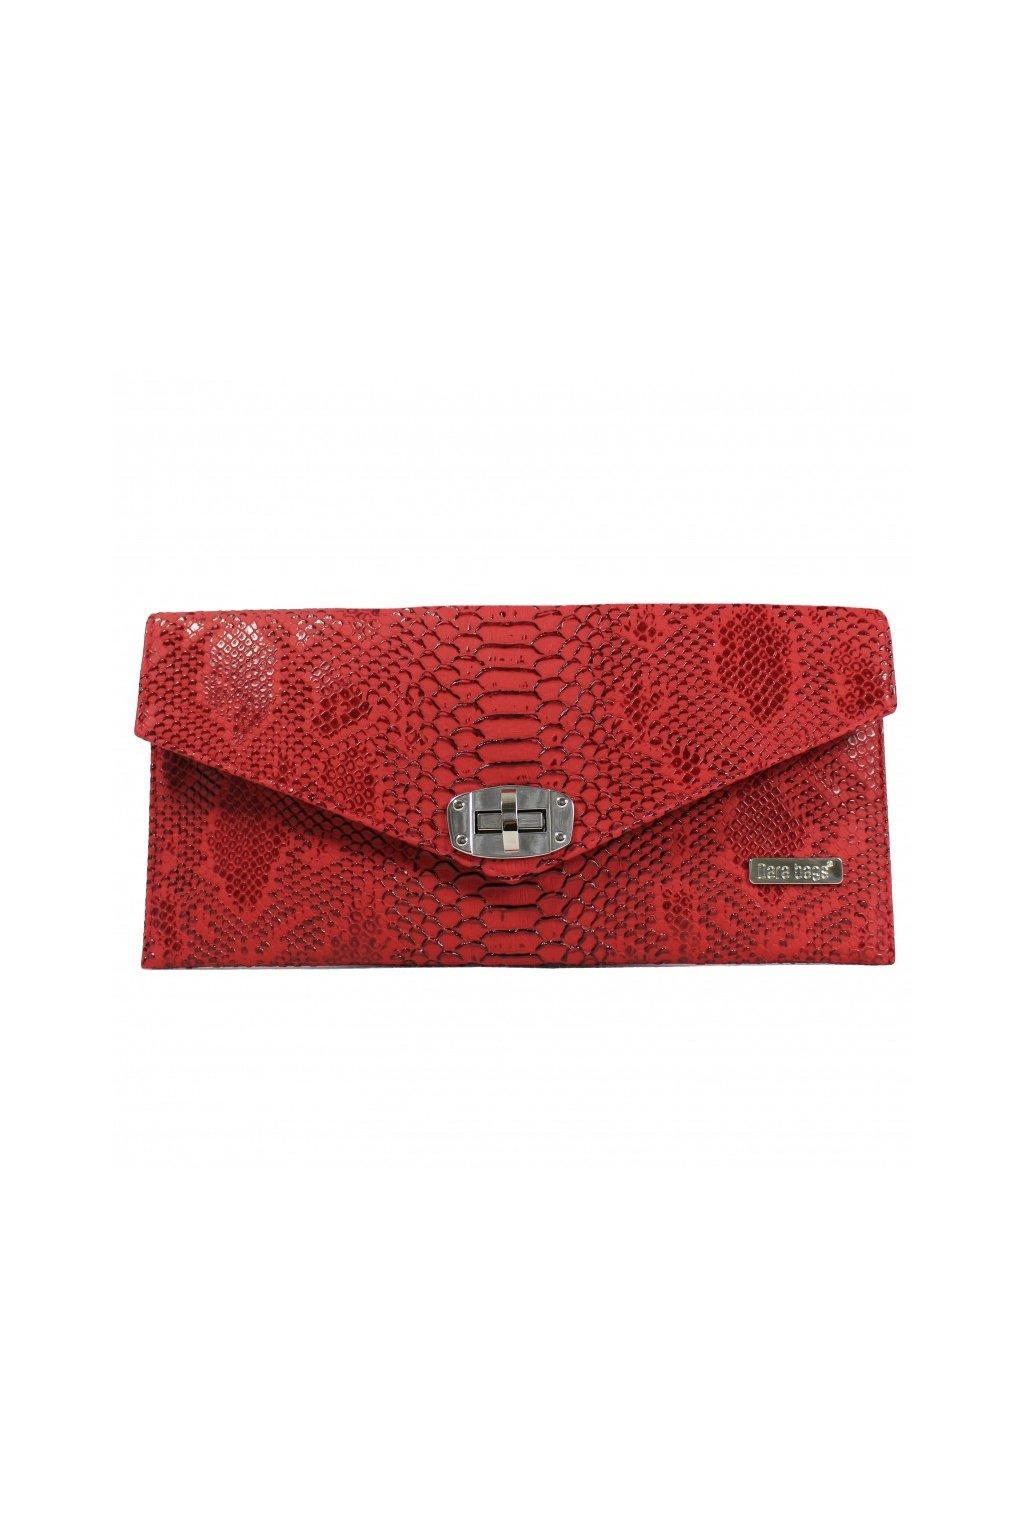 Mala kabelka Malibu Classy cervena 1